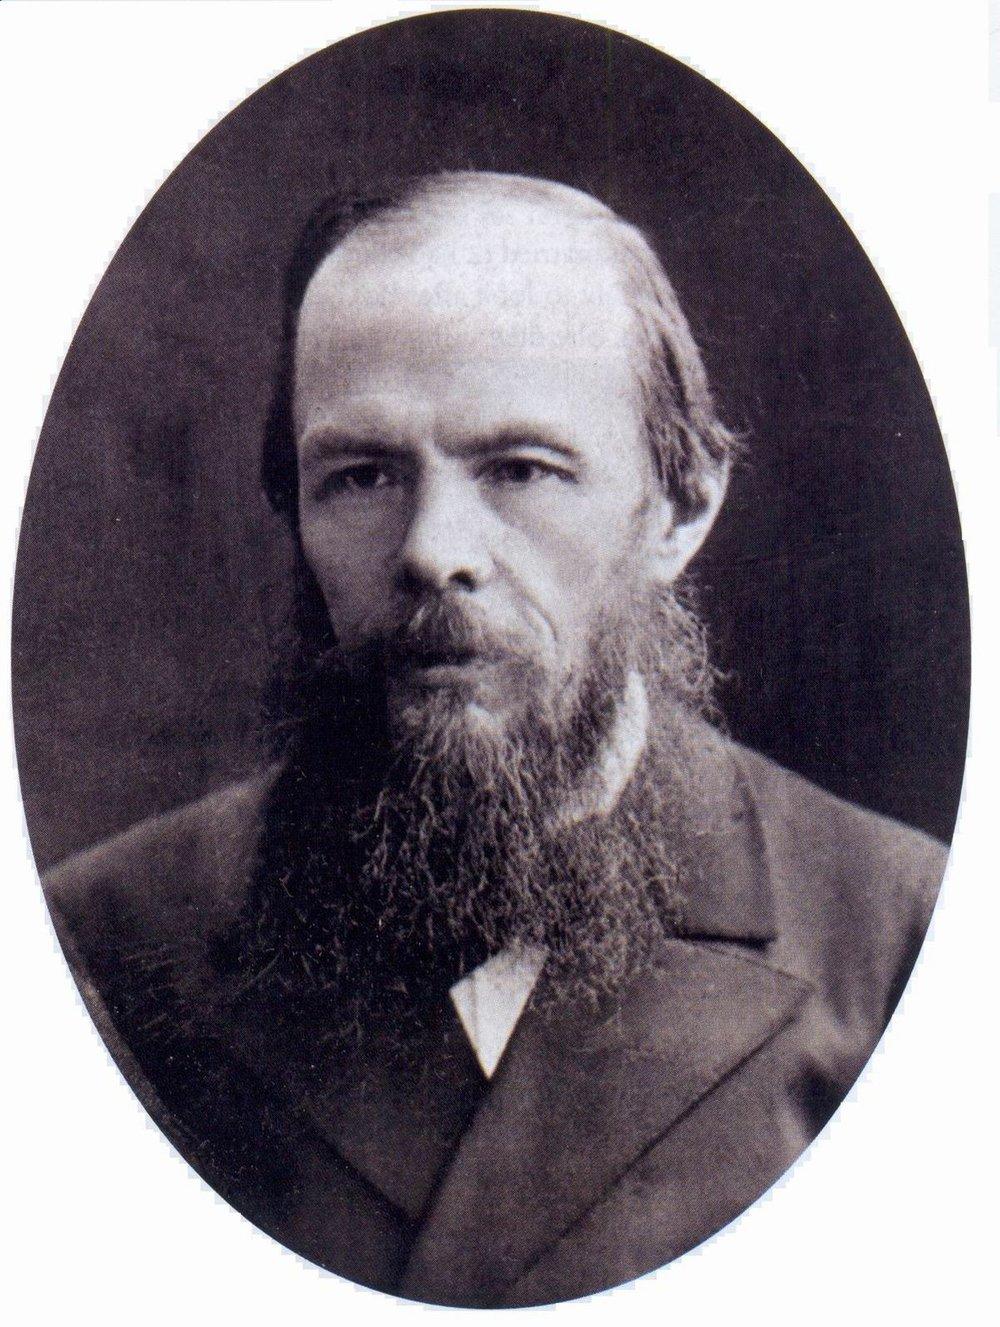 1200px-Dostoevsky.jpg